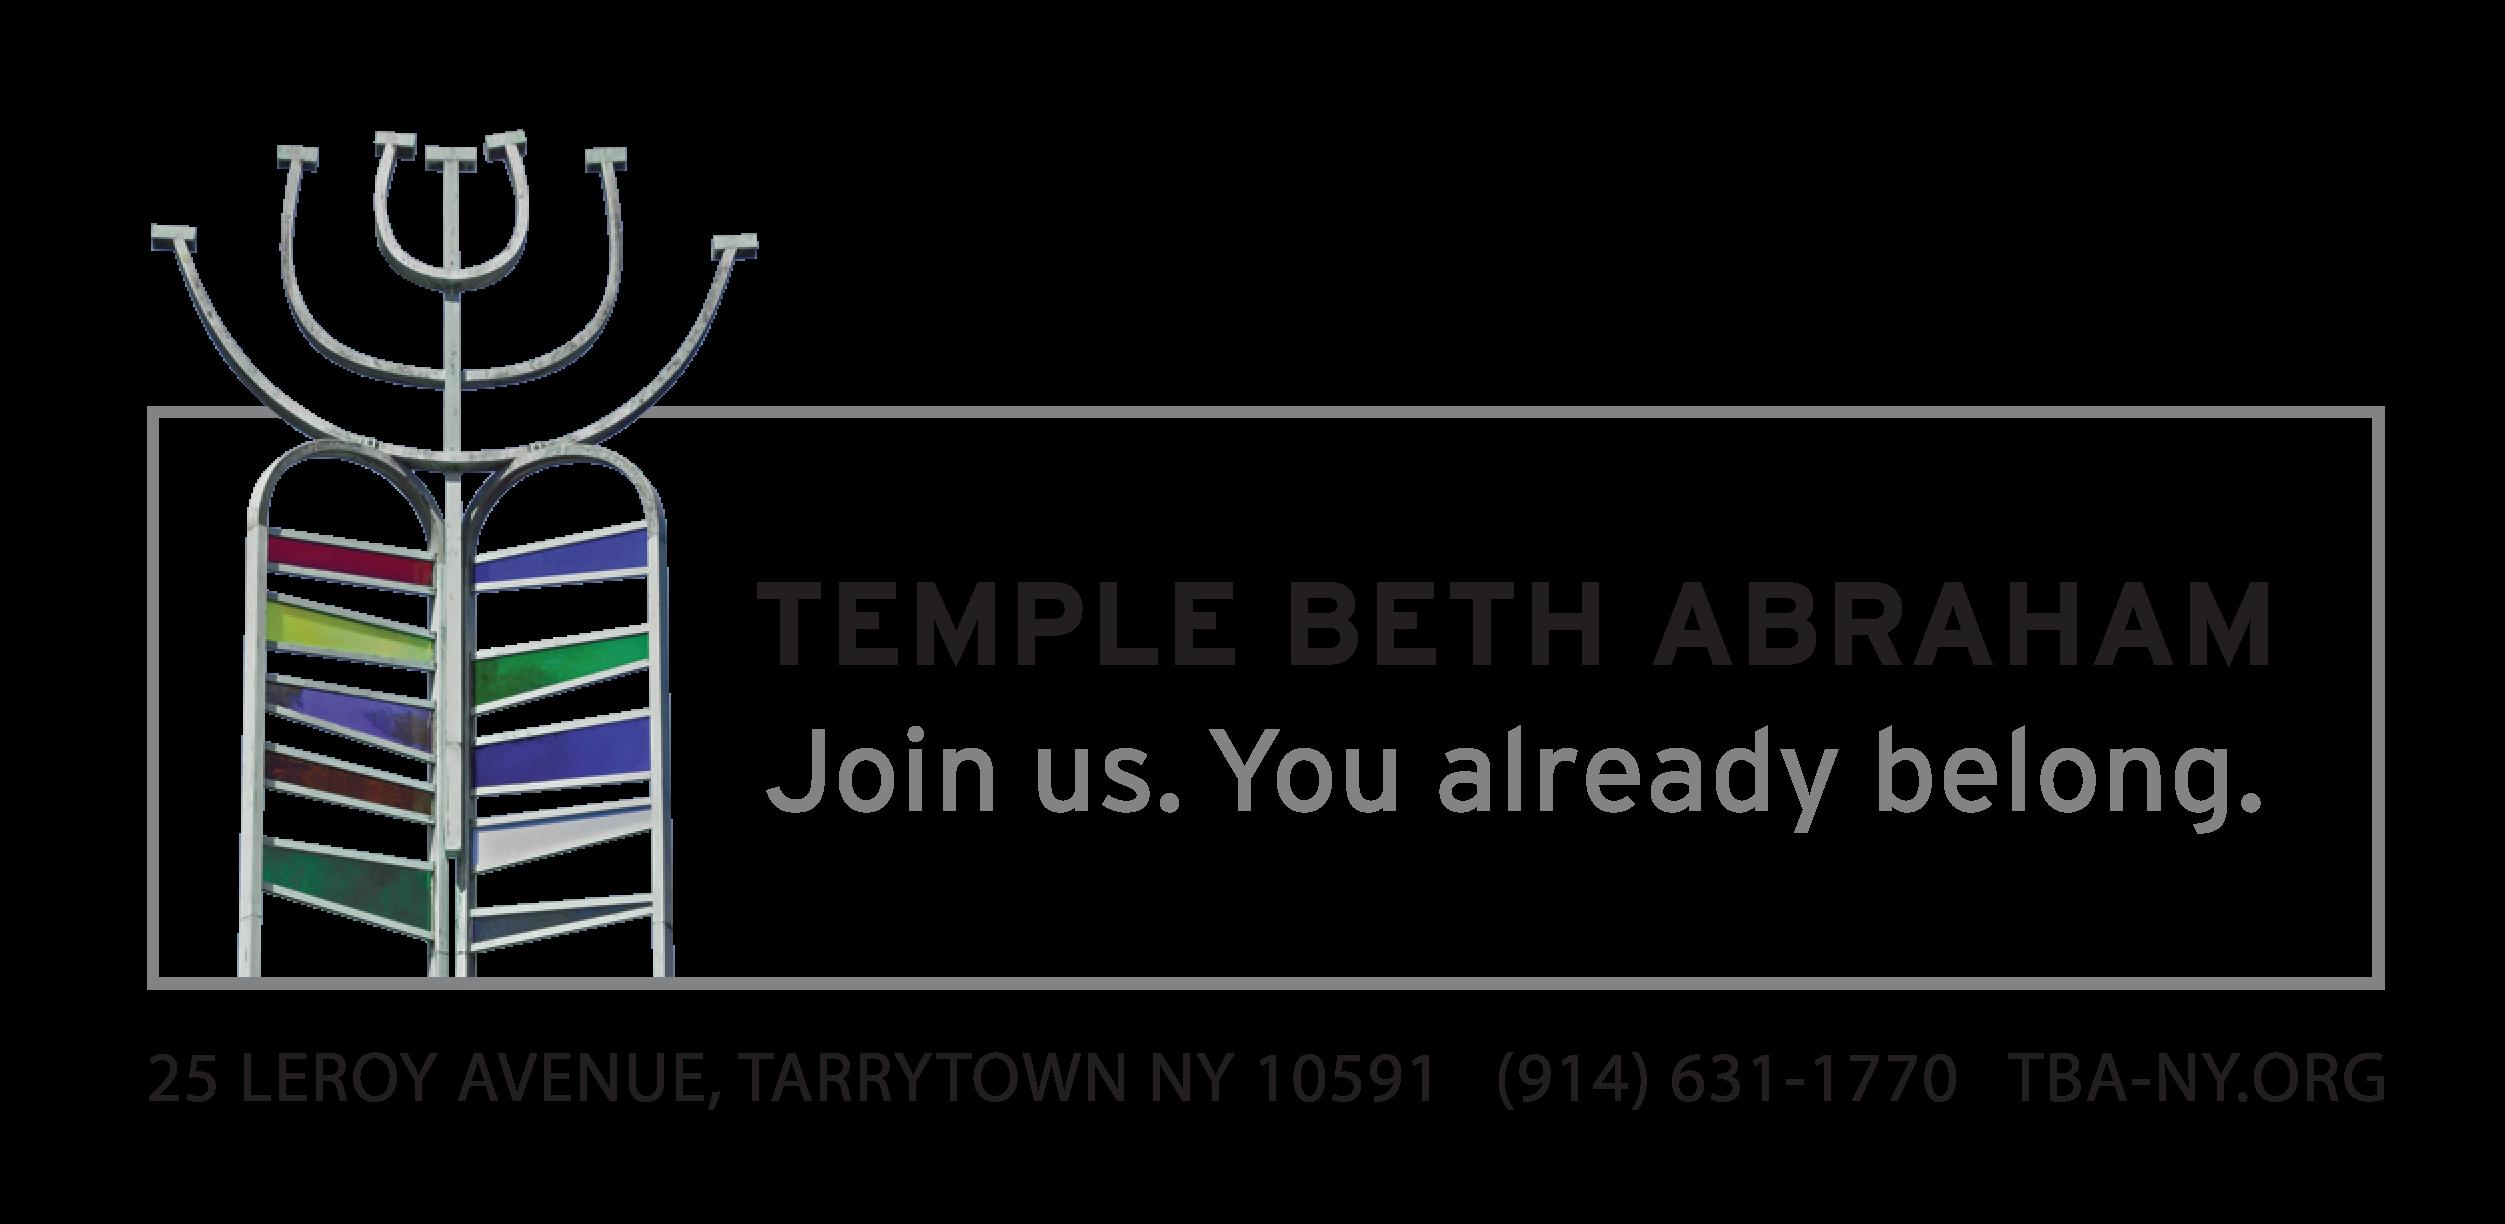 Temple Beth Abraham logo